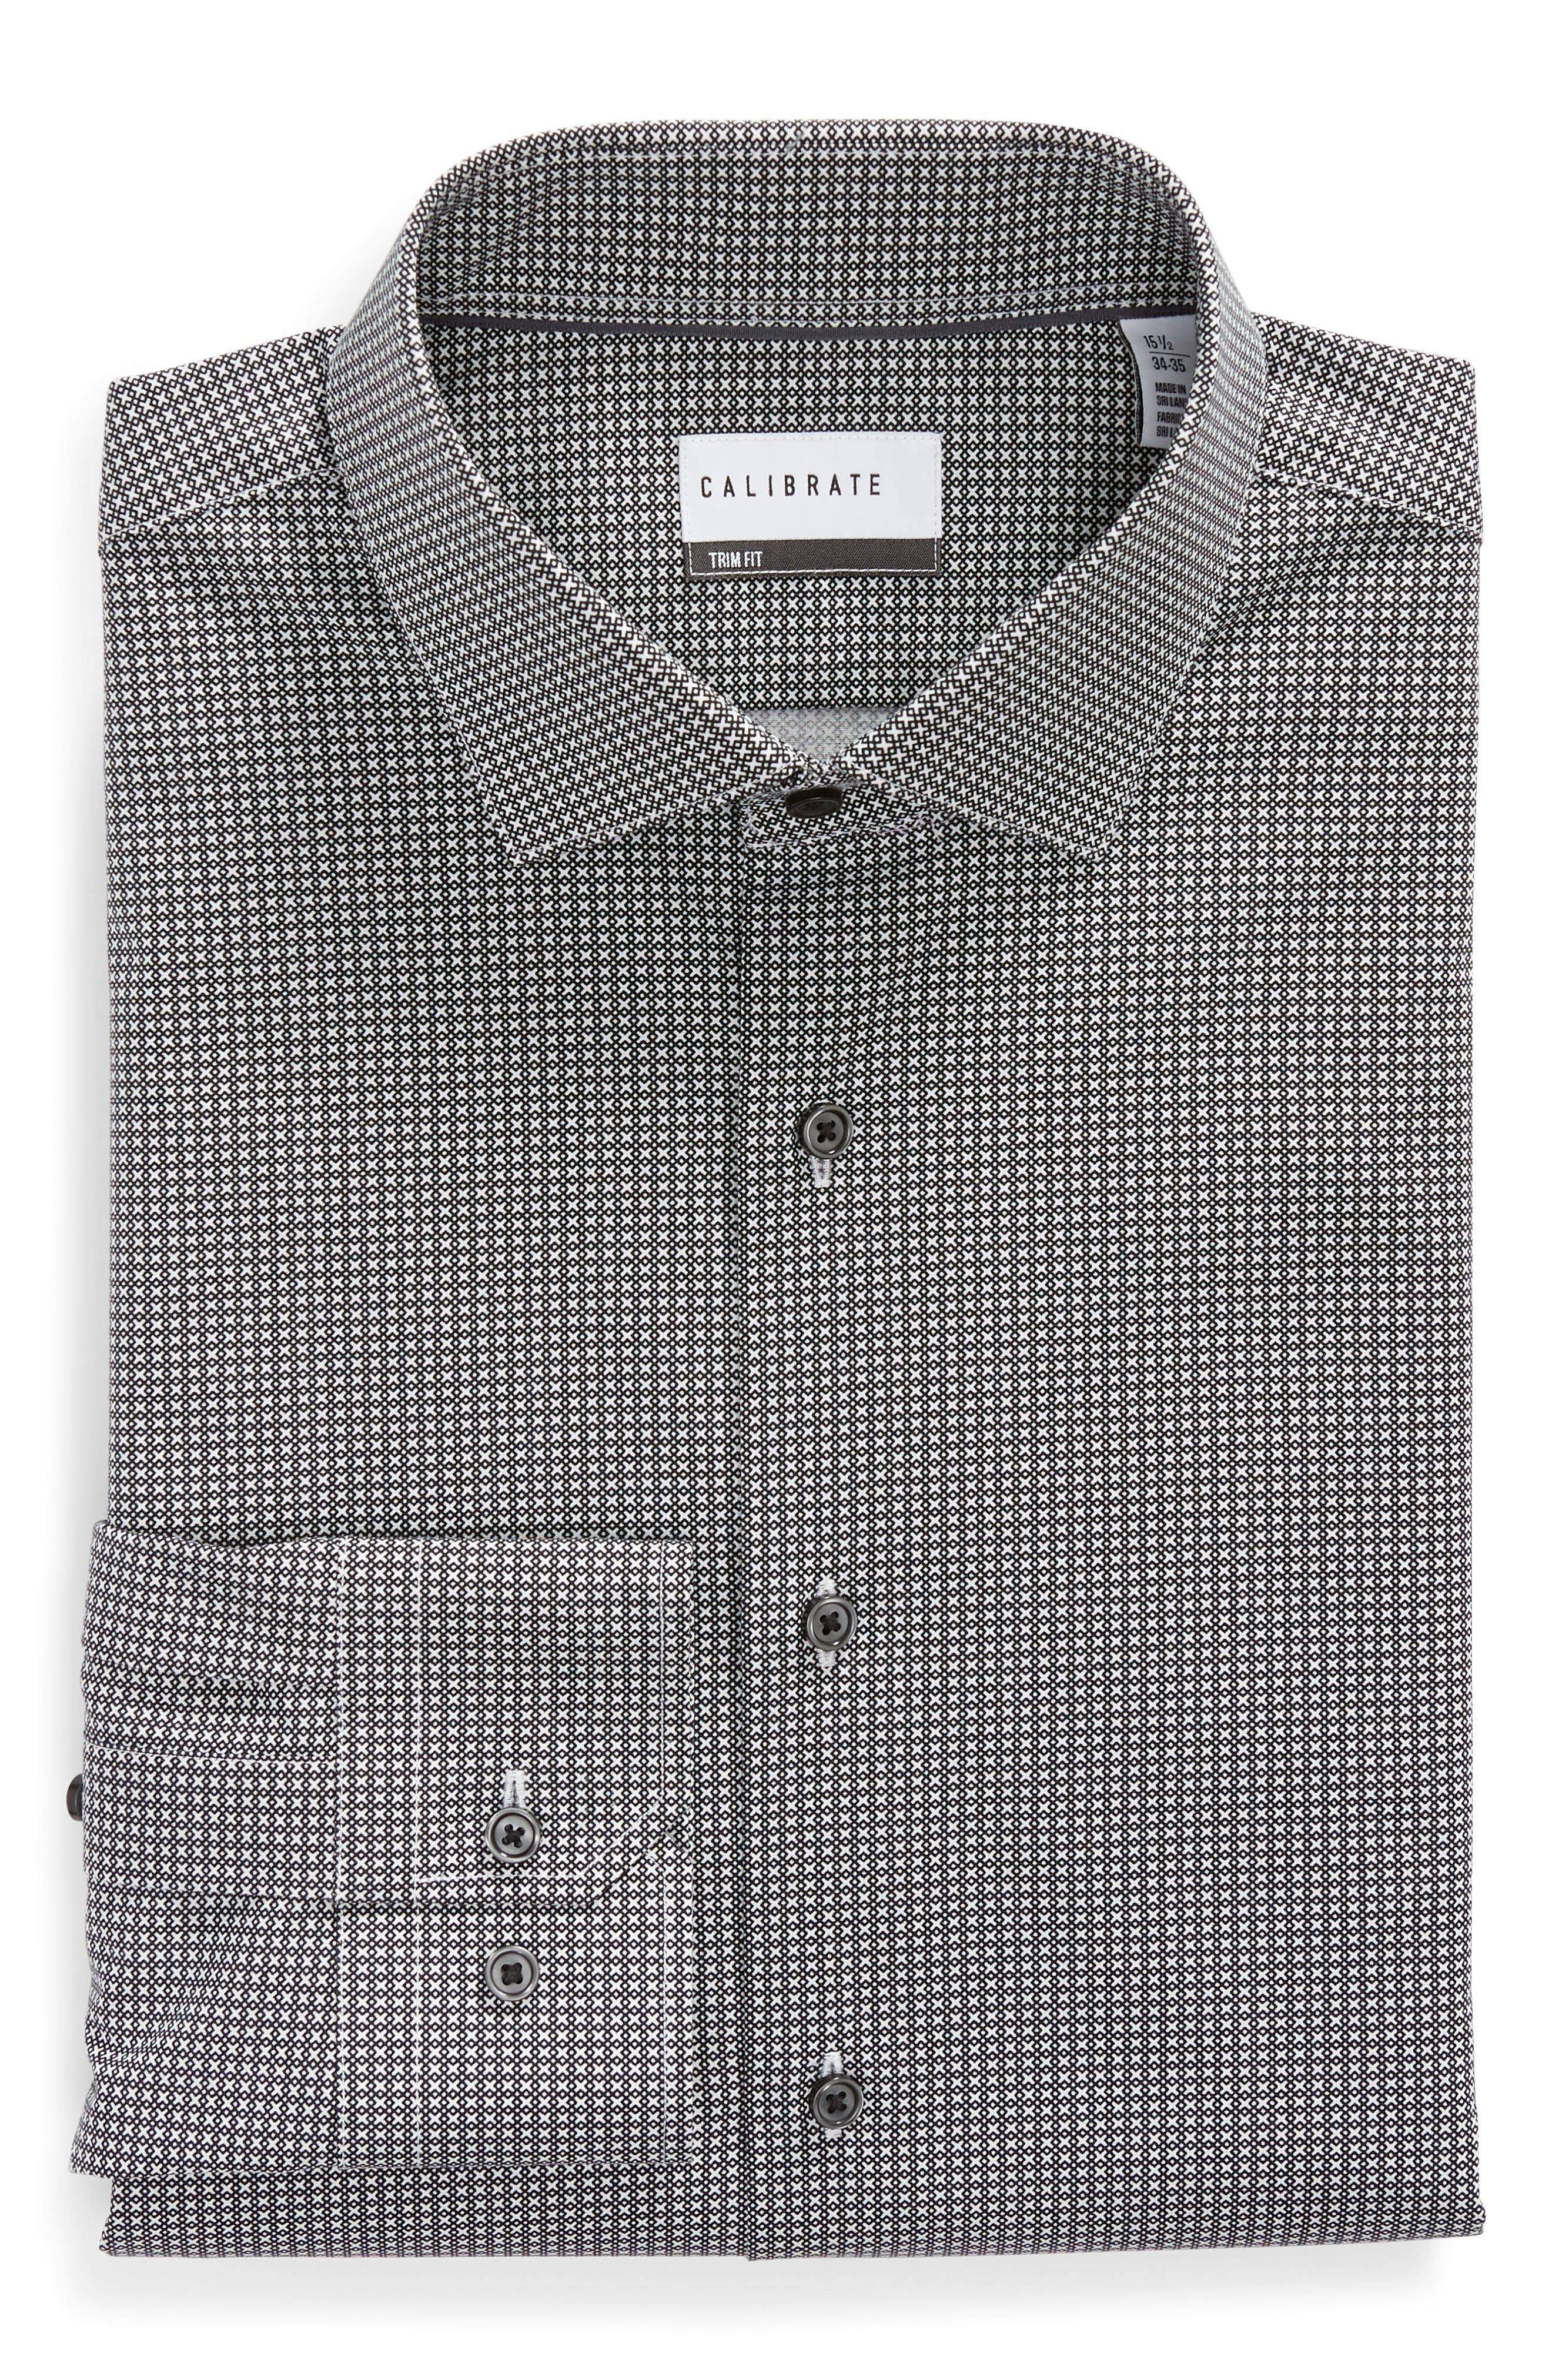 Trim Fit Stretch Non-Iron Geometric Dress Shirt,                             Alternate thumbnail 5, color,                             BLACK ROCK